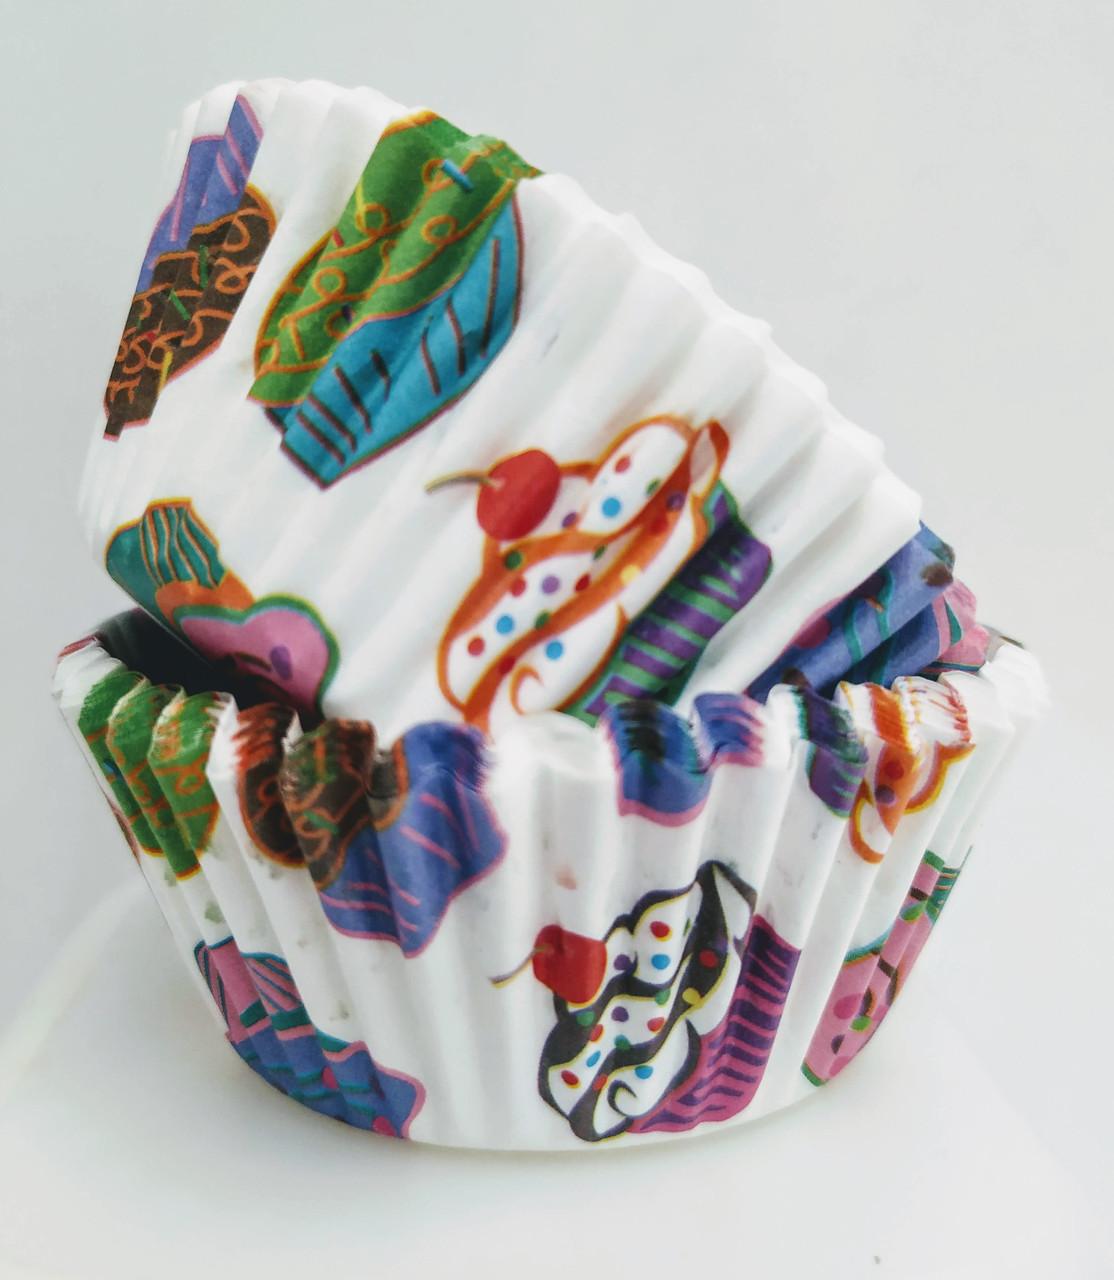 Форма бумажная для кексов тарталетка 1000 шт.